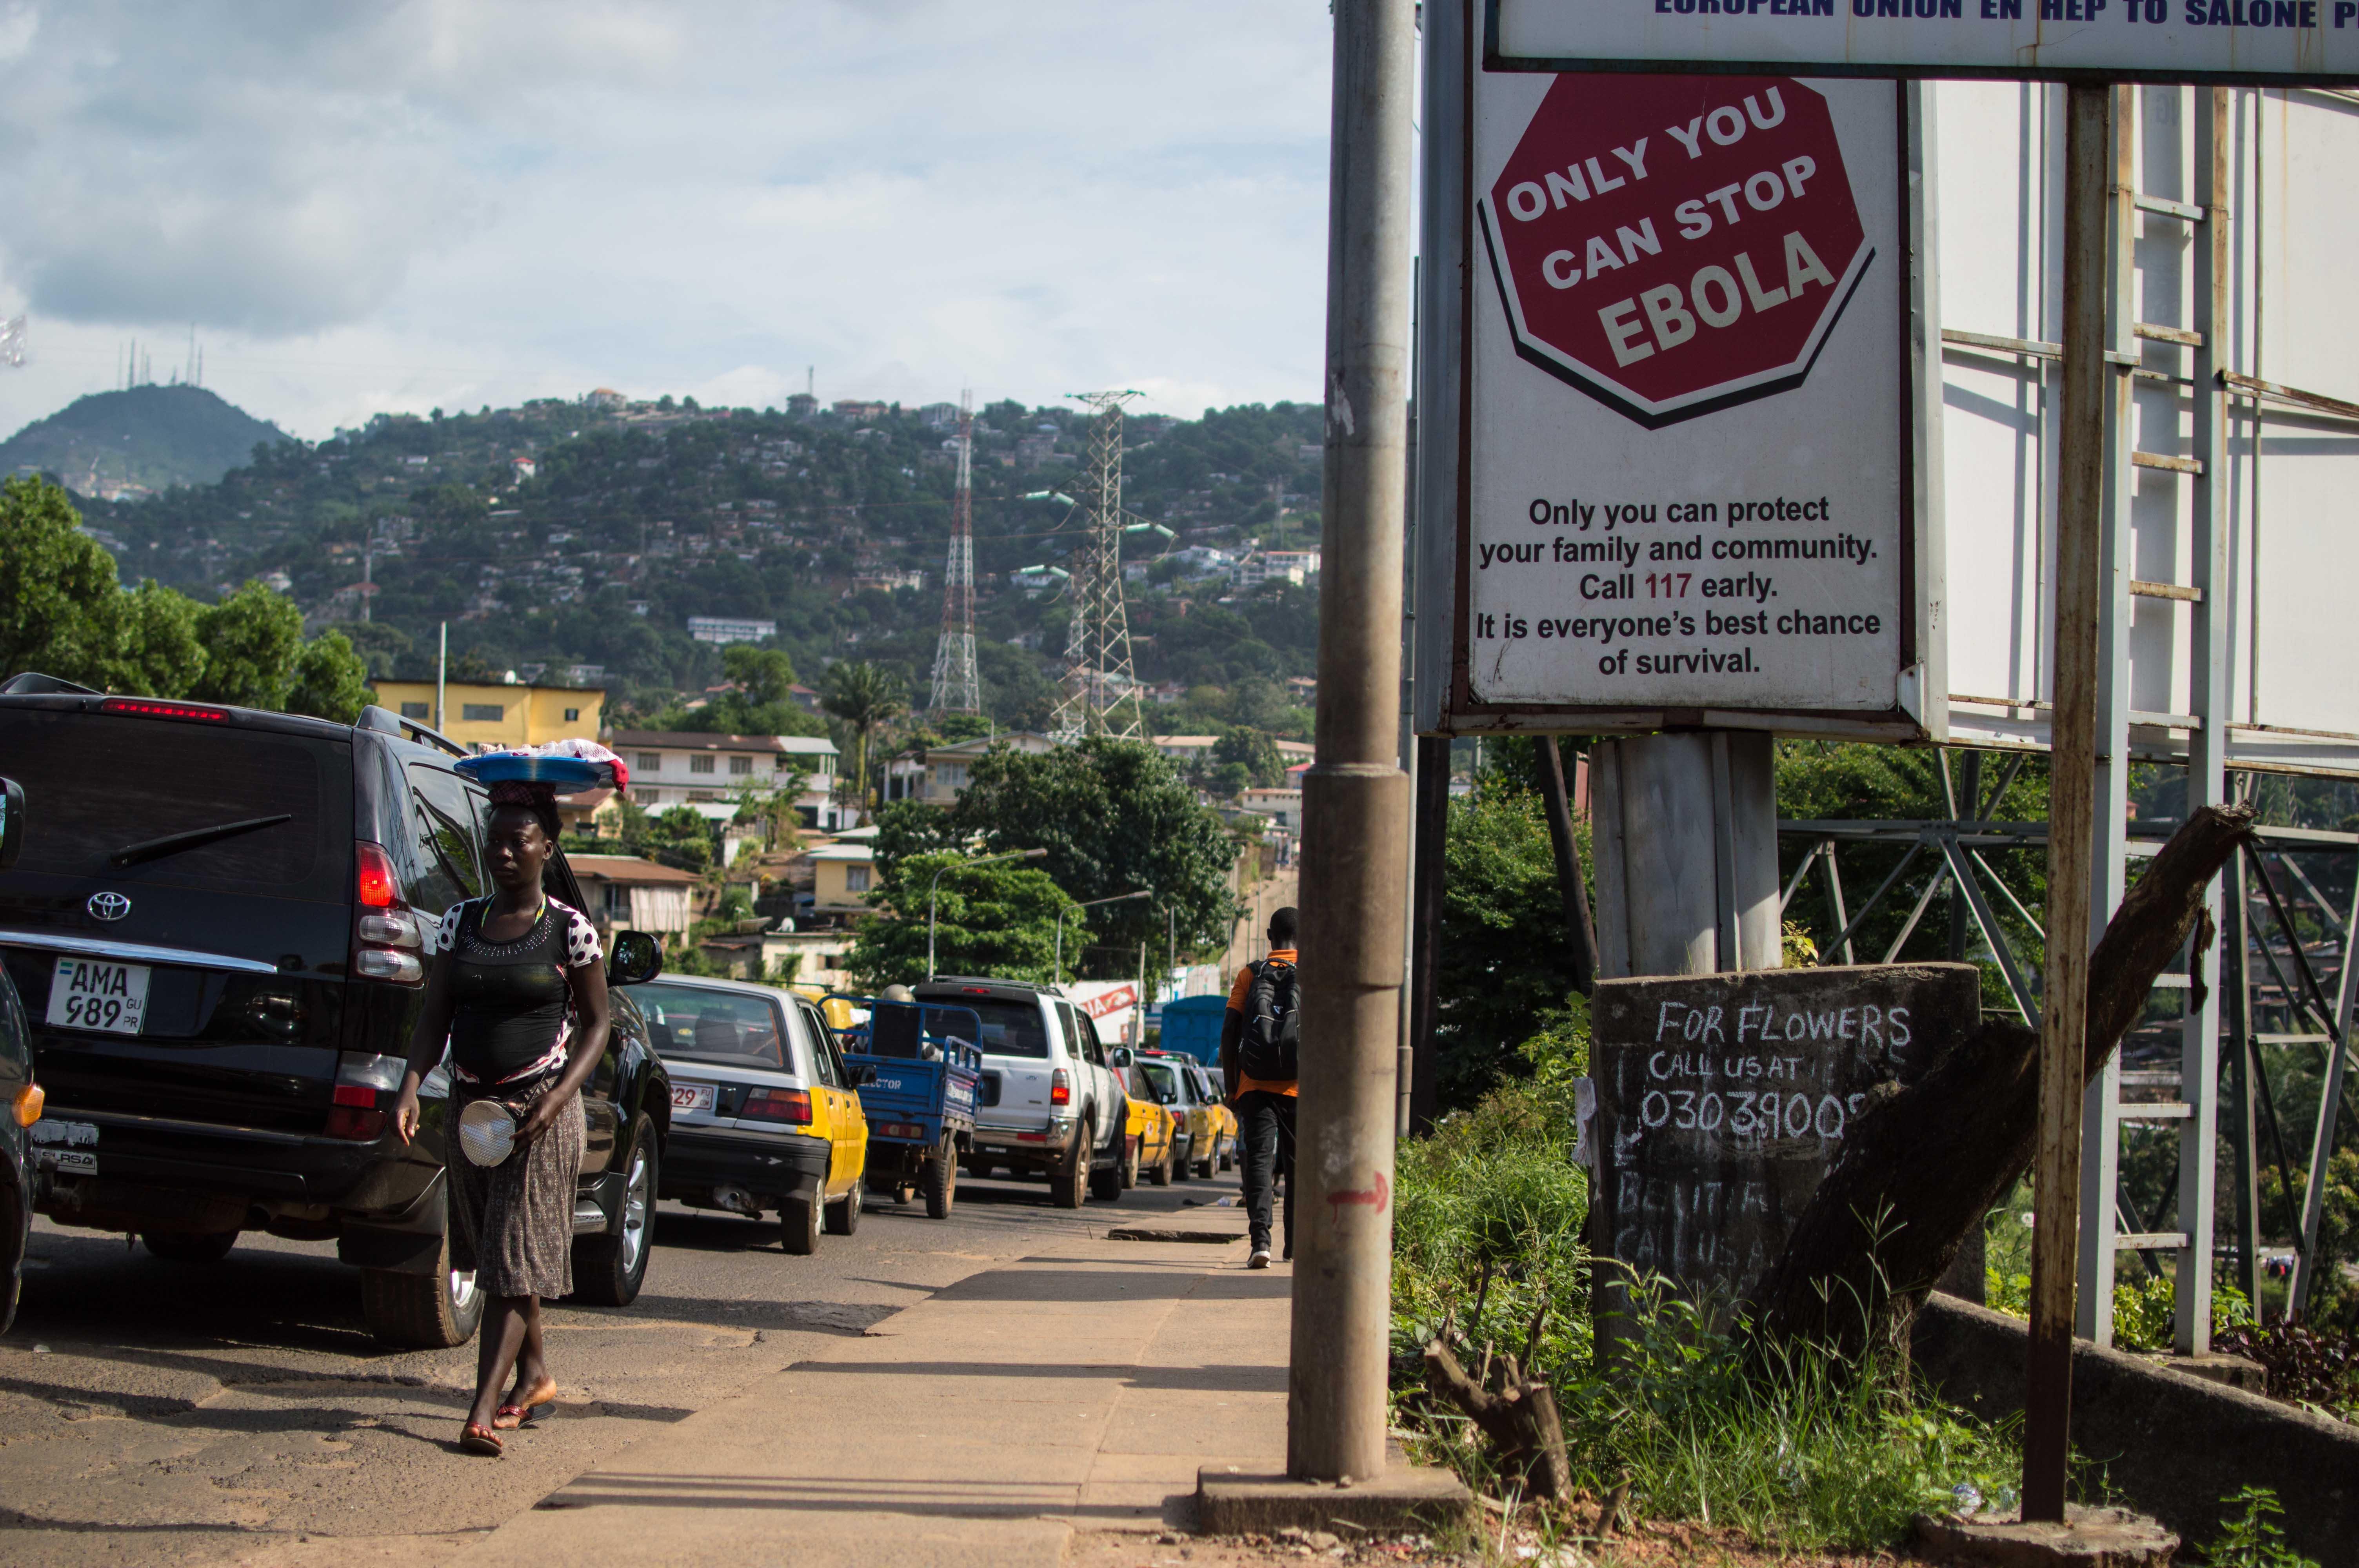 Ebola sign 2.jpg